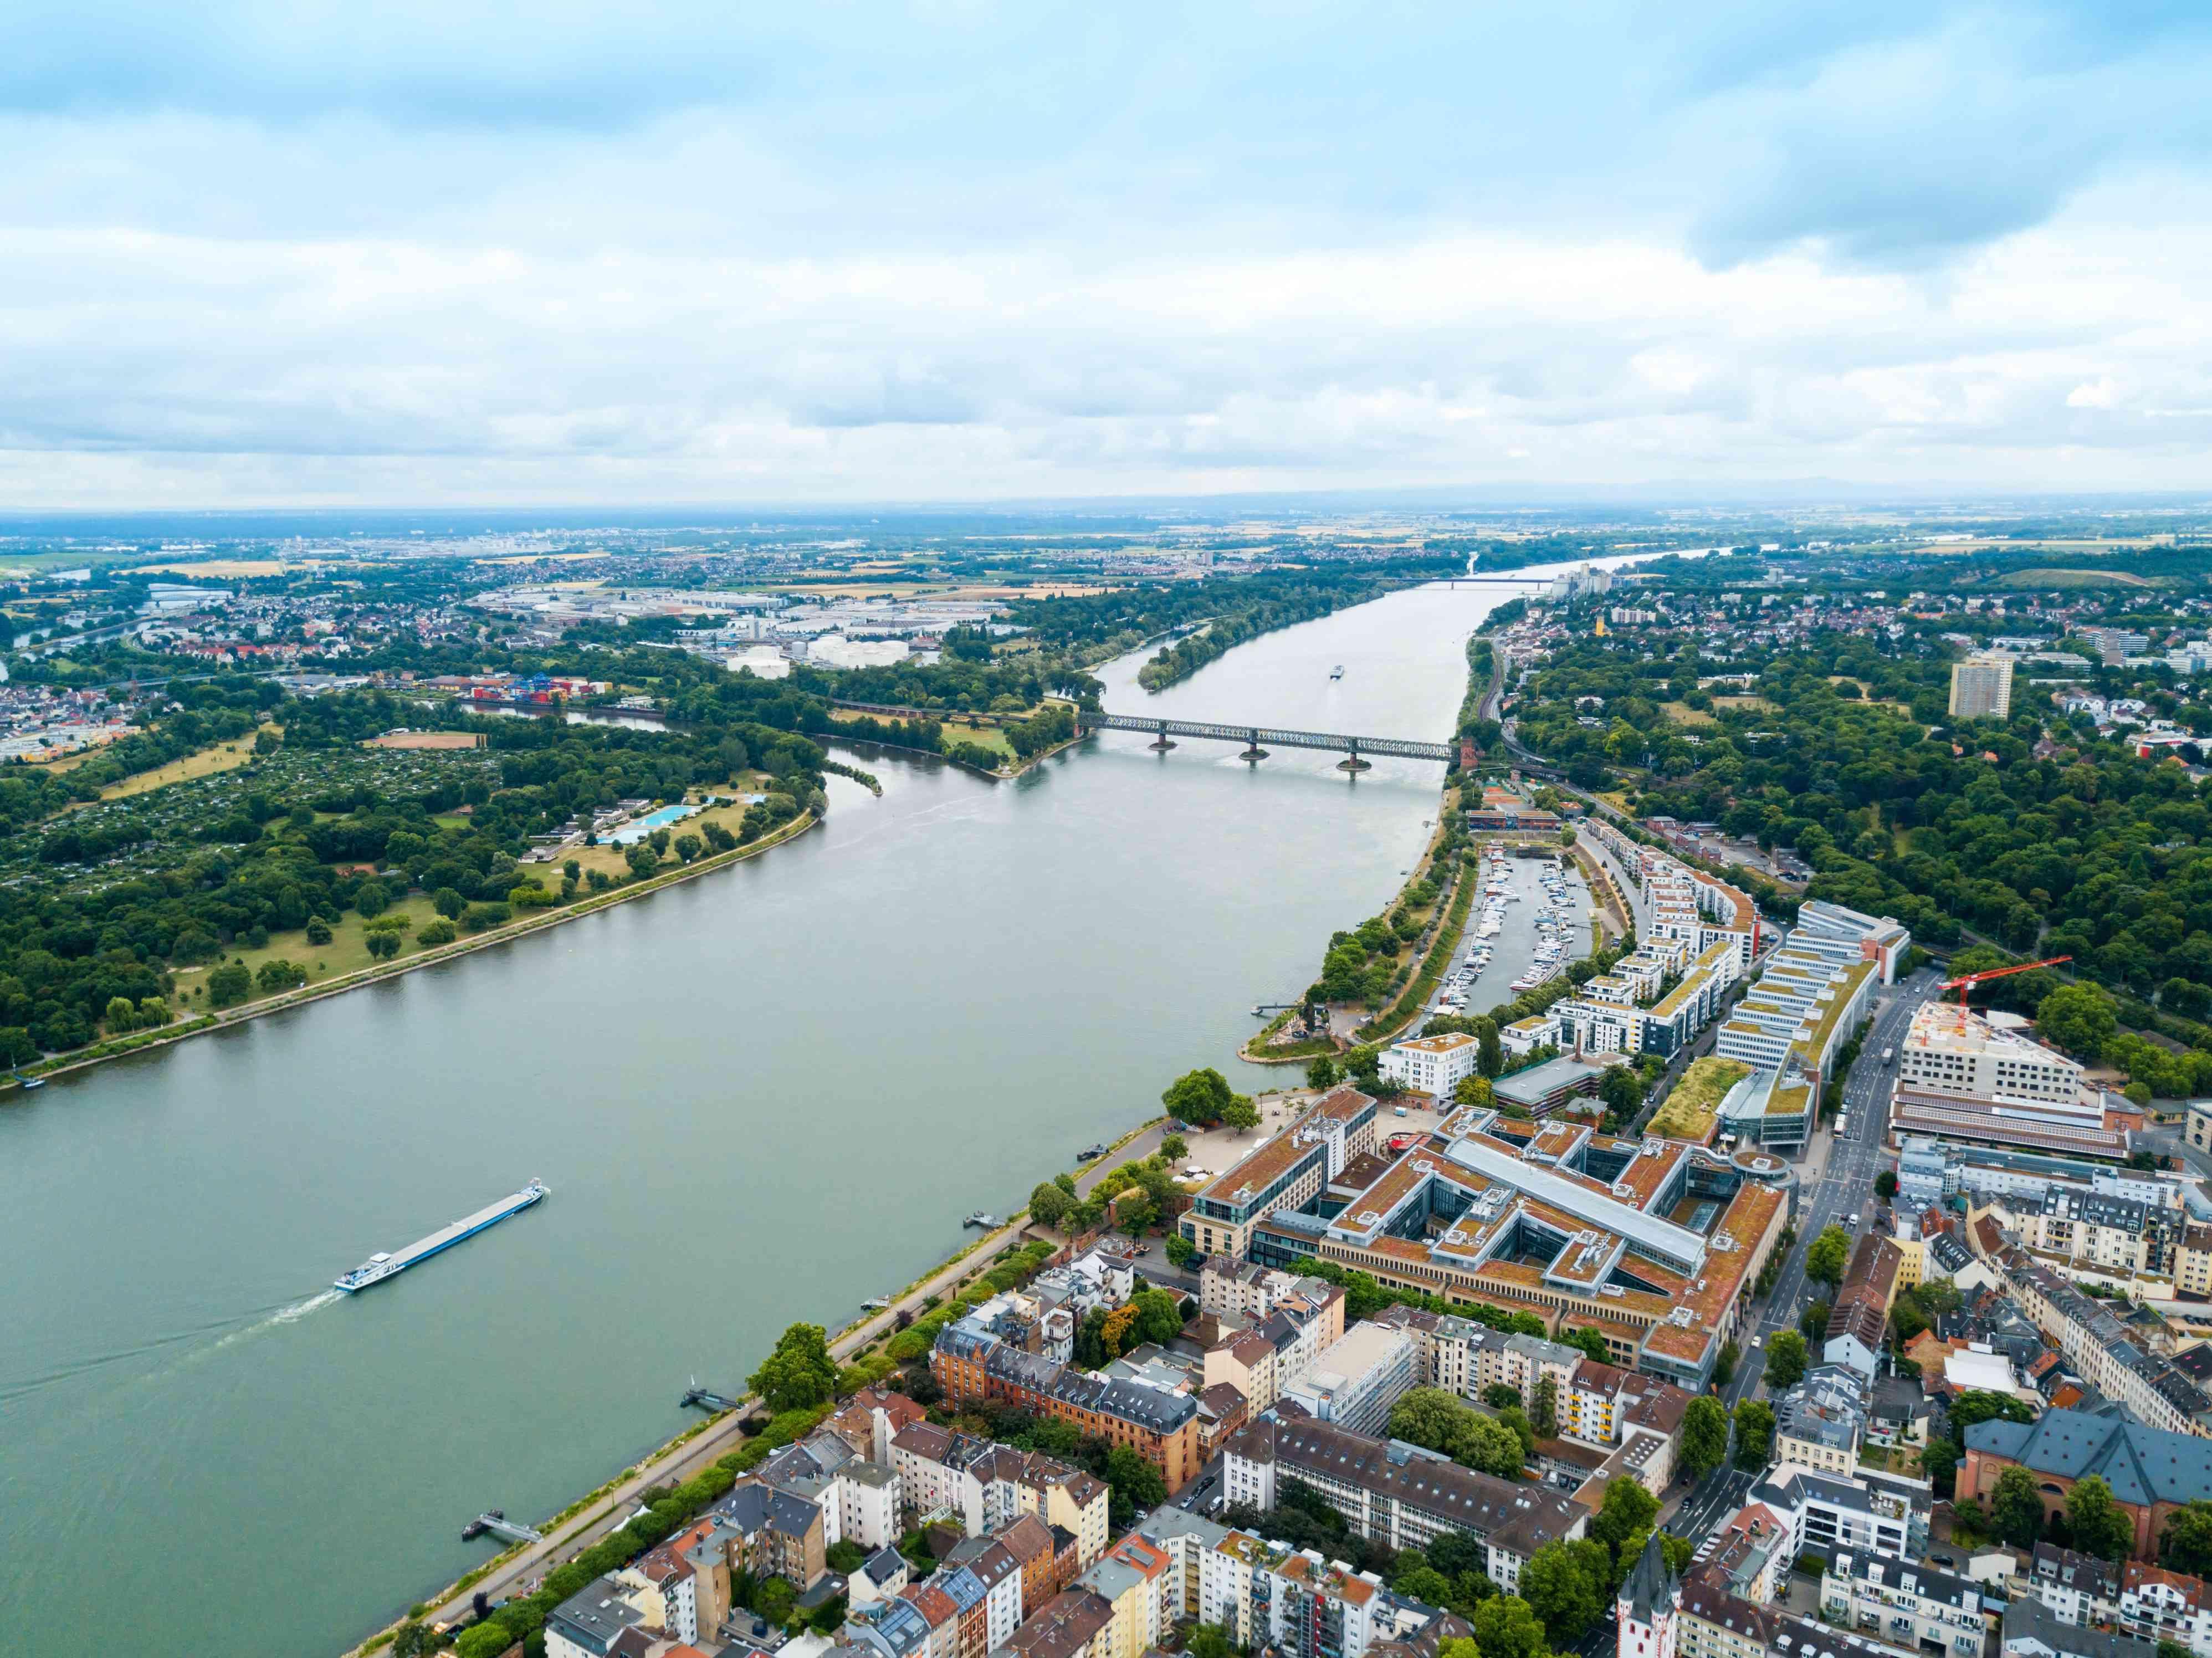 Rhine river in Mainz aerial panoramic view